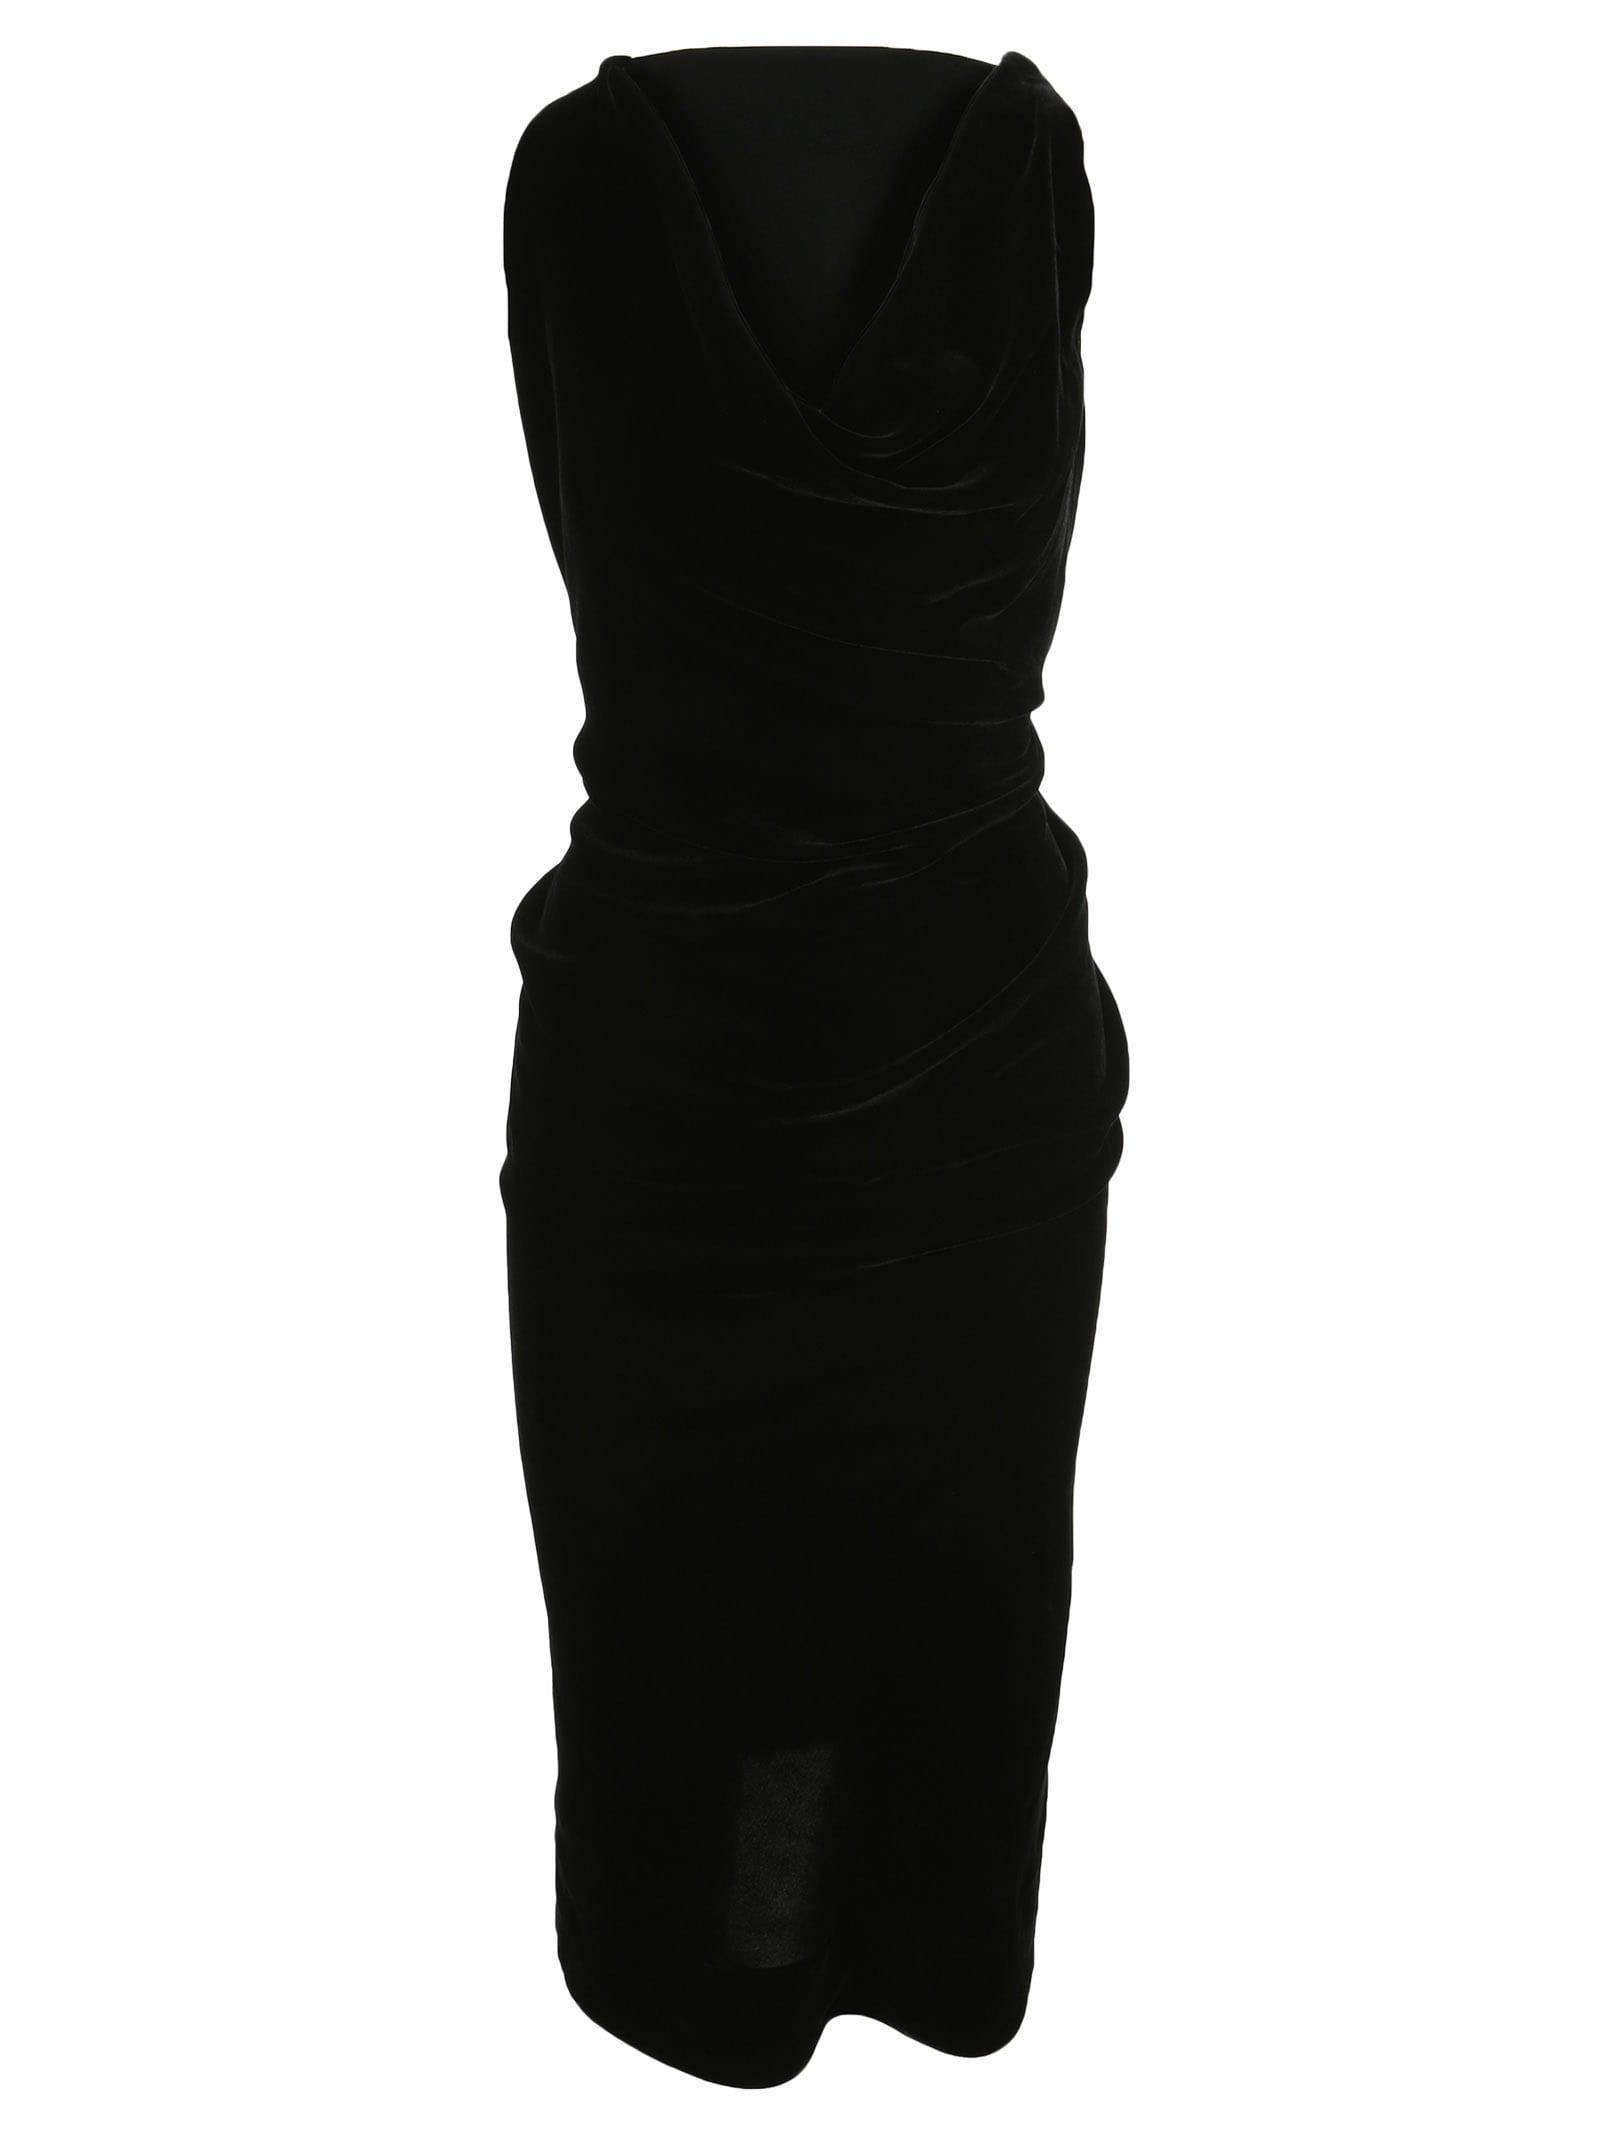 Anglomania Virginia Dress